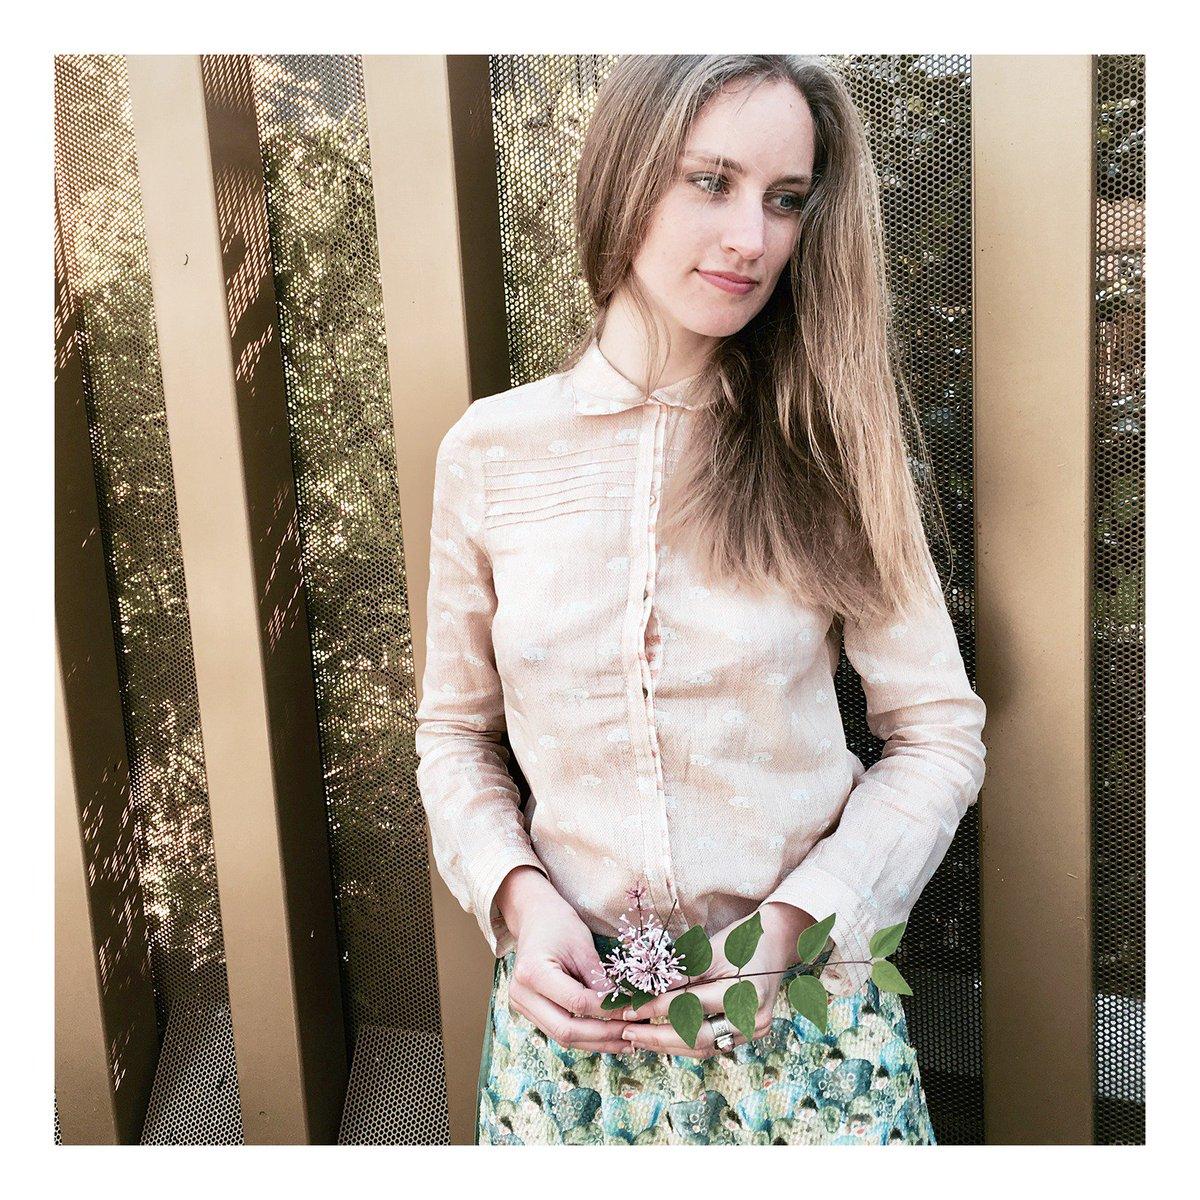 Optons pour le #look #tendance fresh and french  #cotelac #chemise #pattern #jupe #spring  https:// goo.gl/CskcK1  &nbsp;    https:// goo.gl/0jRCxz  &nbsp;  <br>http://pic.twitter.com/NDhHGJPGKL